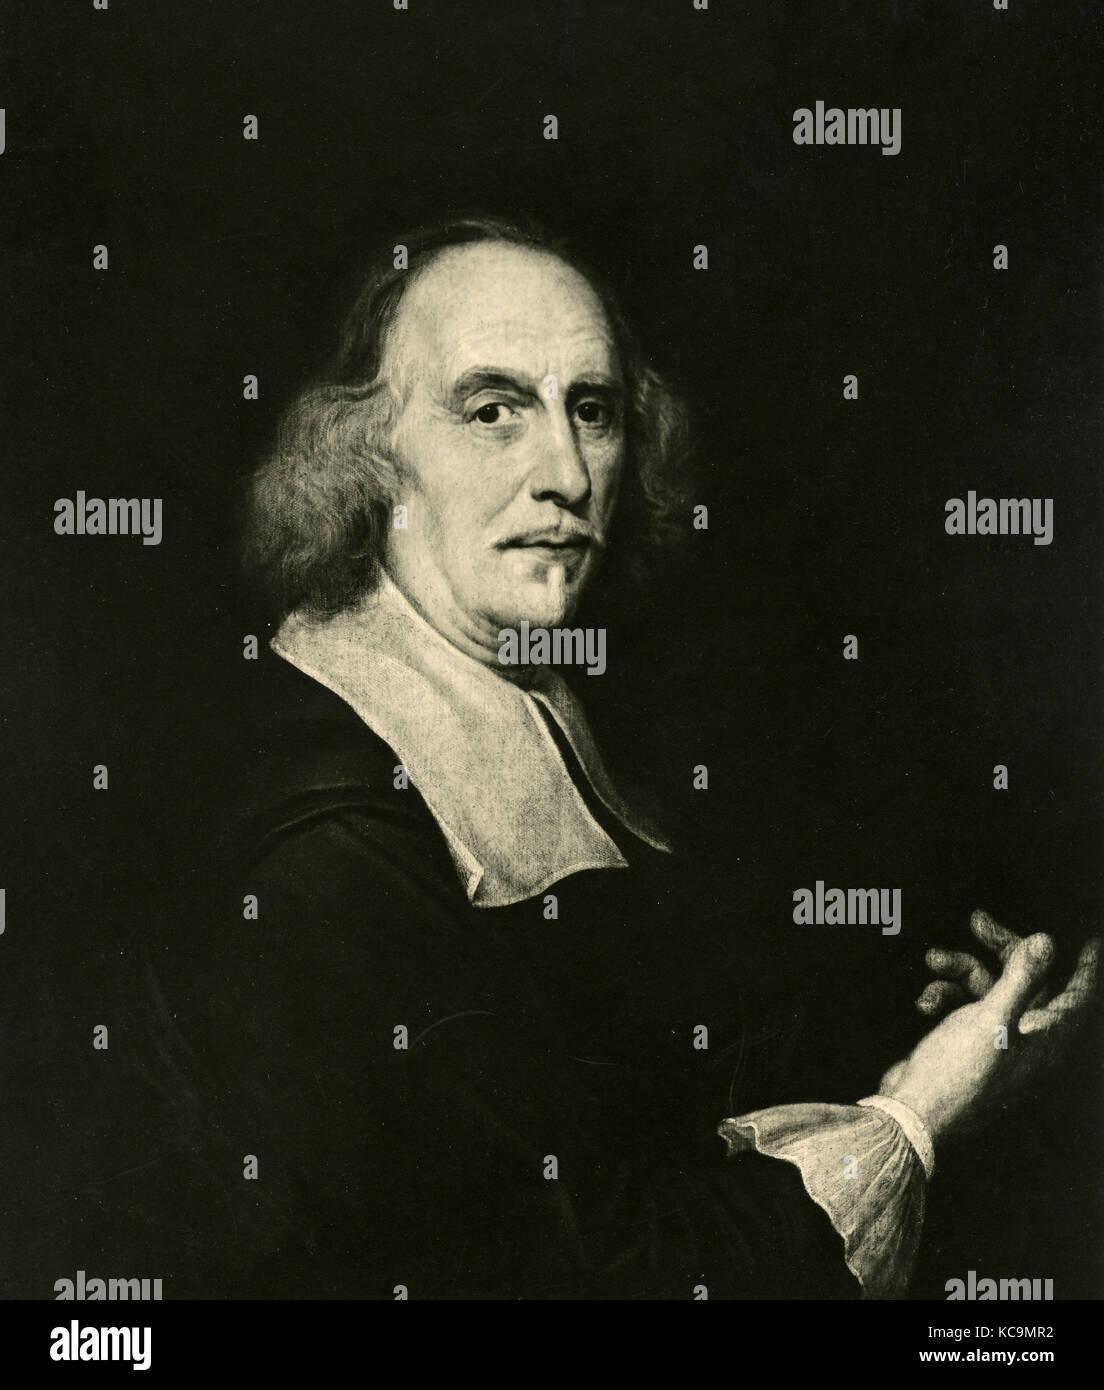 Bernini, portrait by Gauli AKA Baciccio - Stock Image